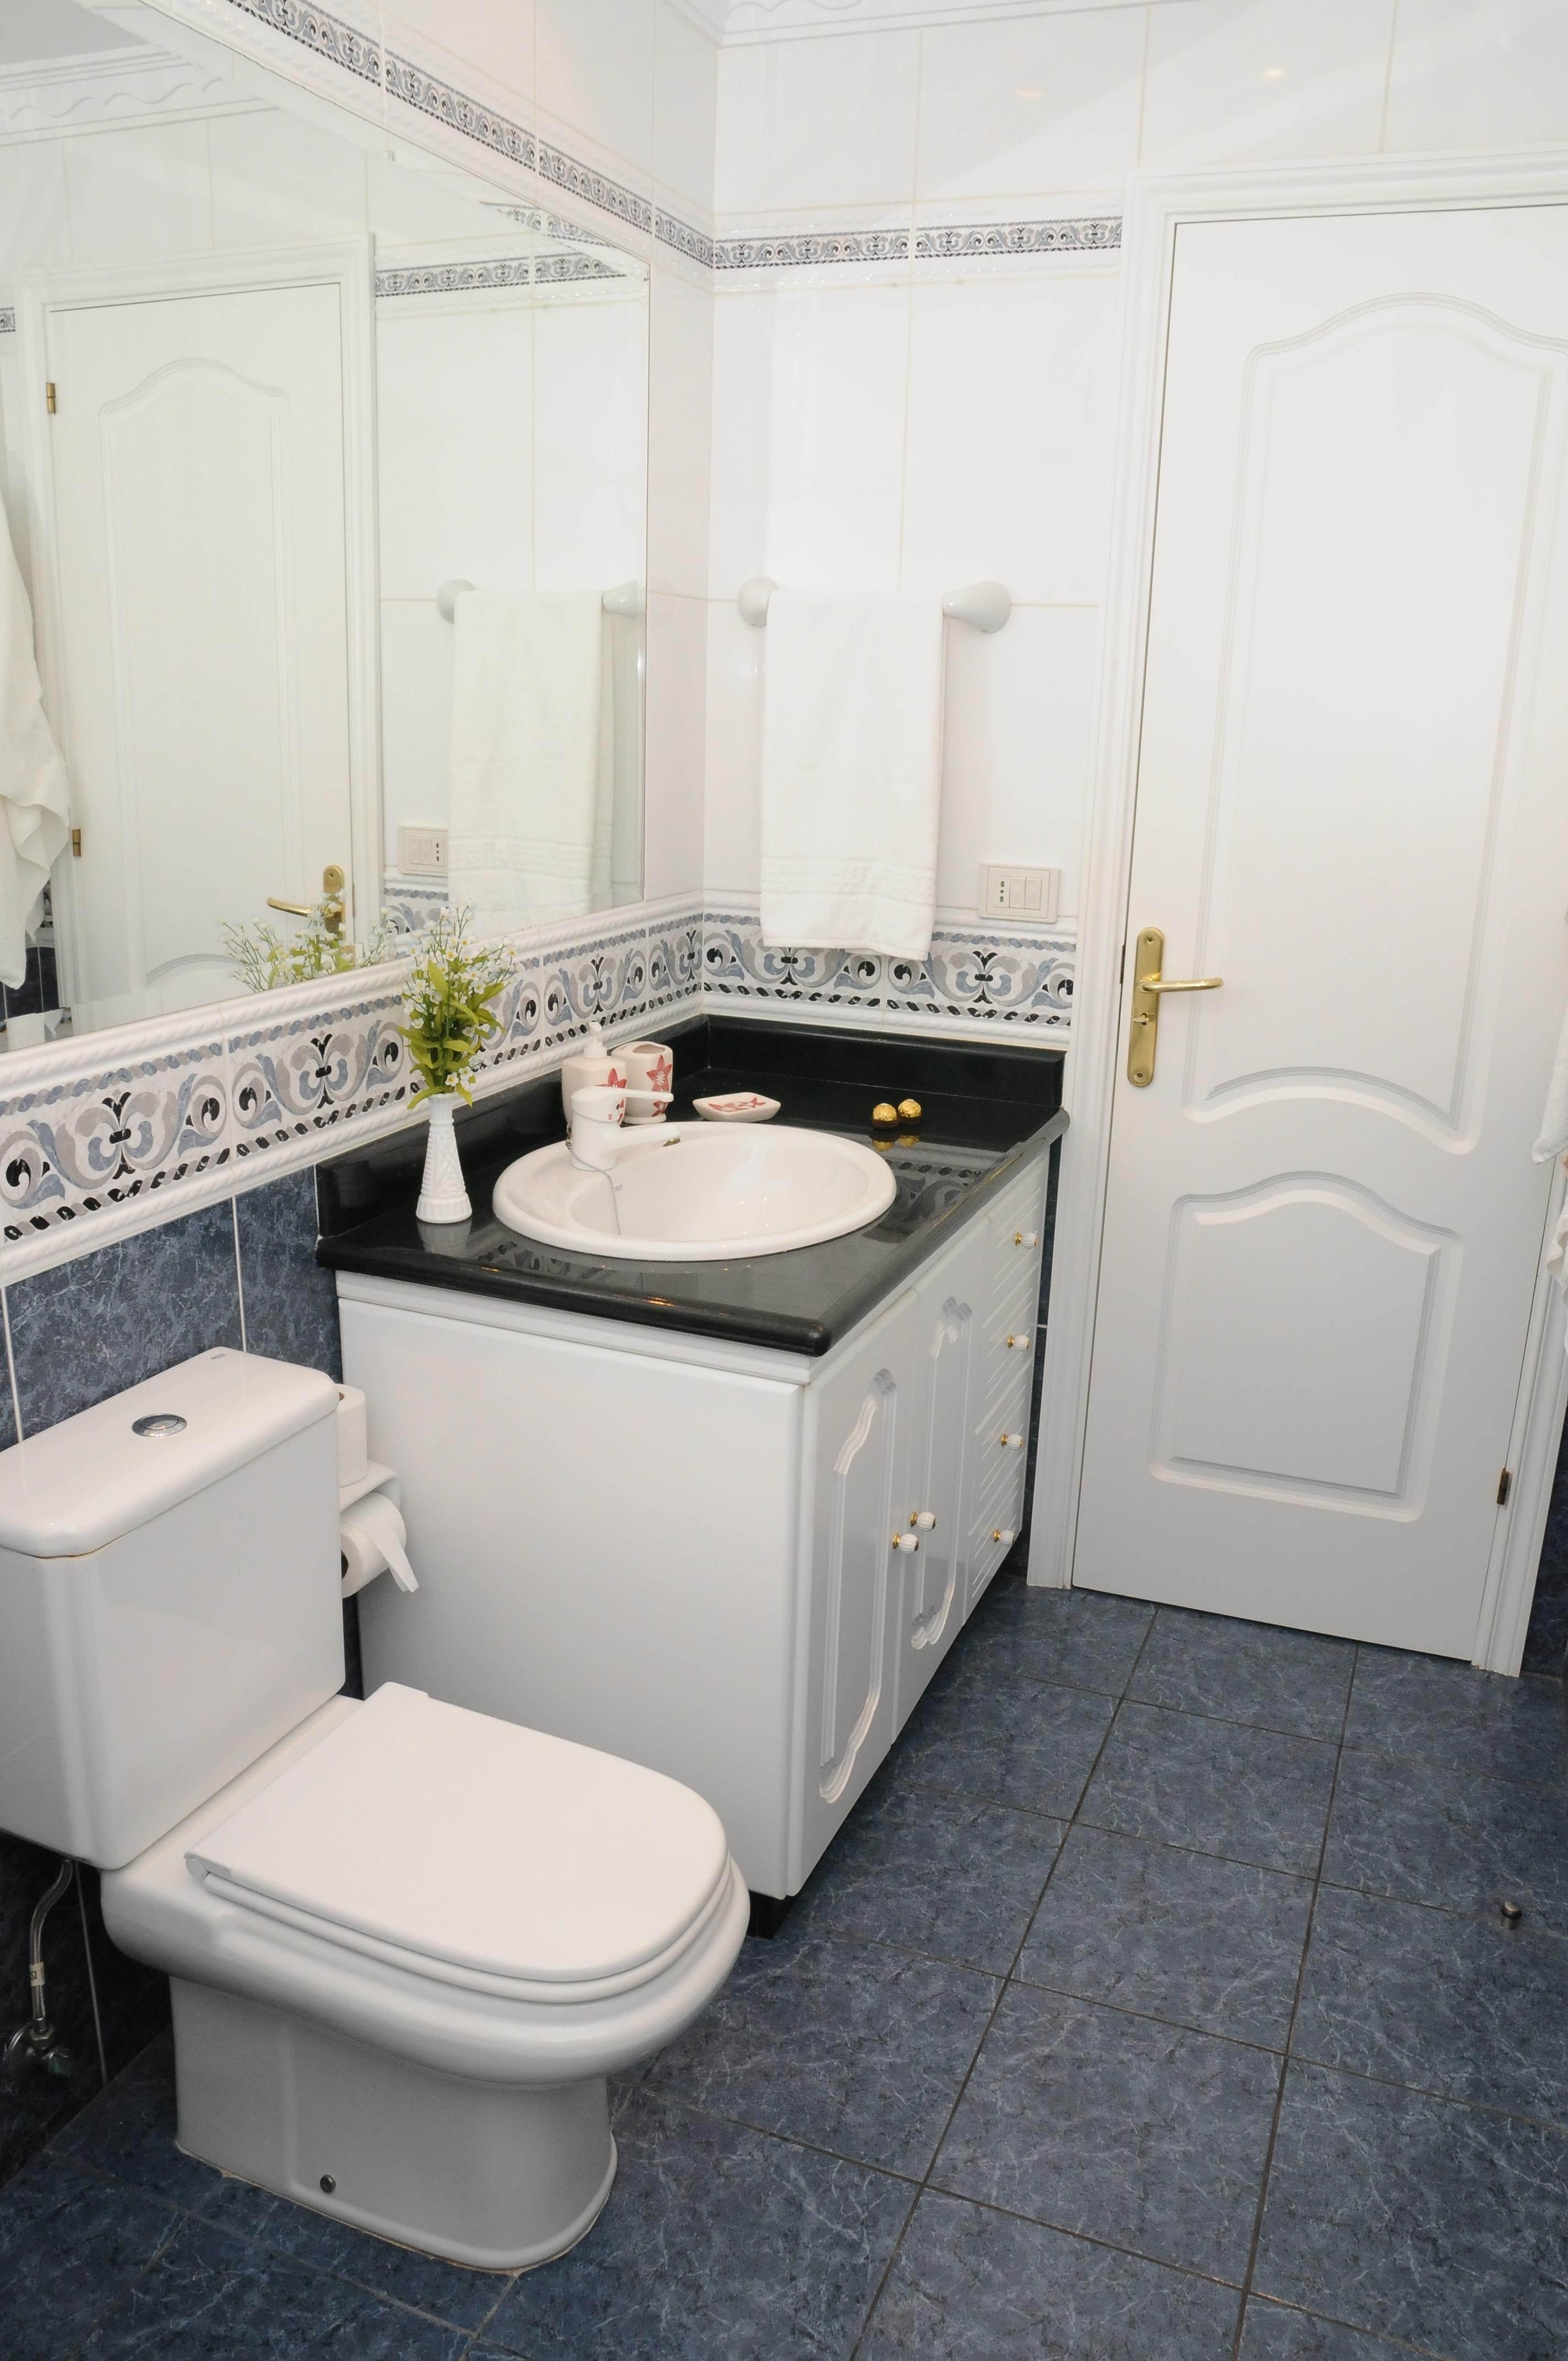 Toilet Room with big Mirror